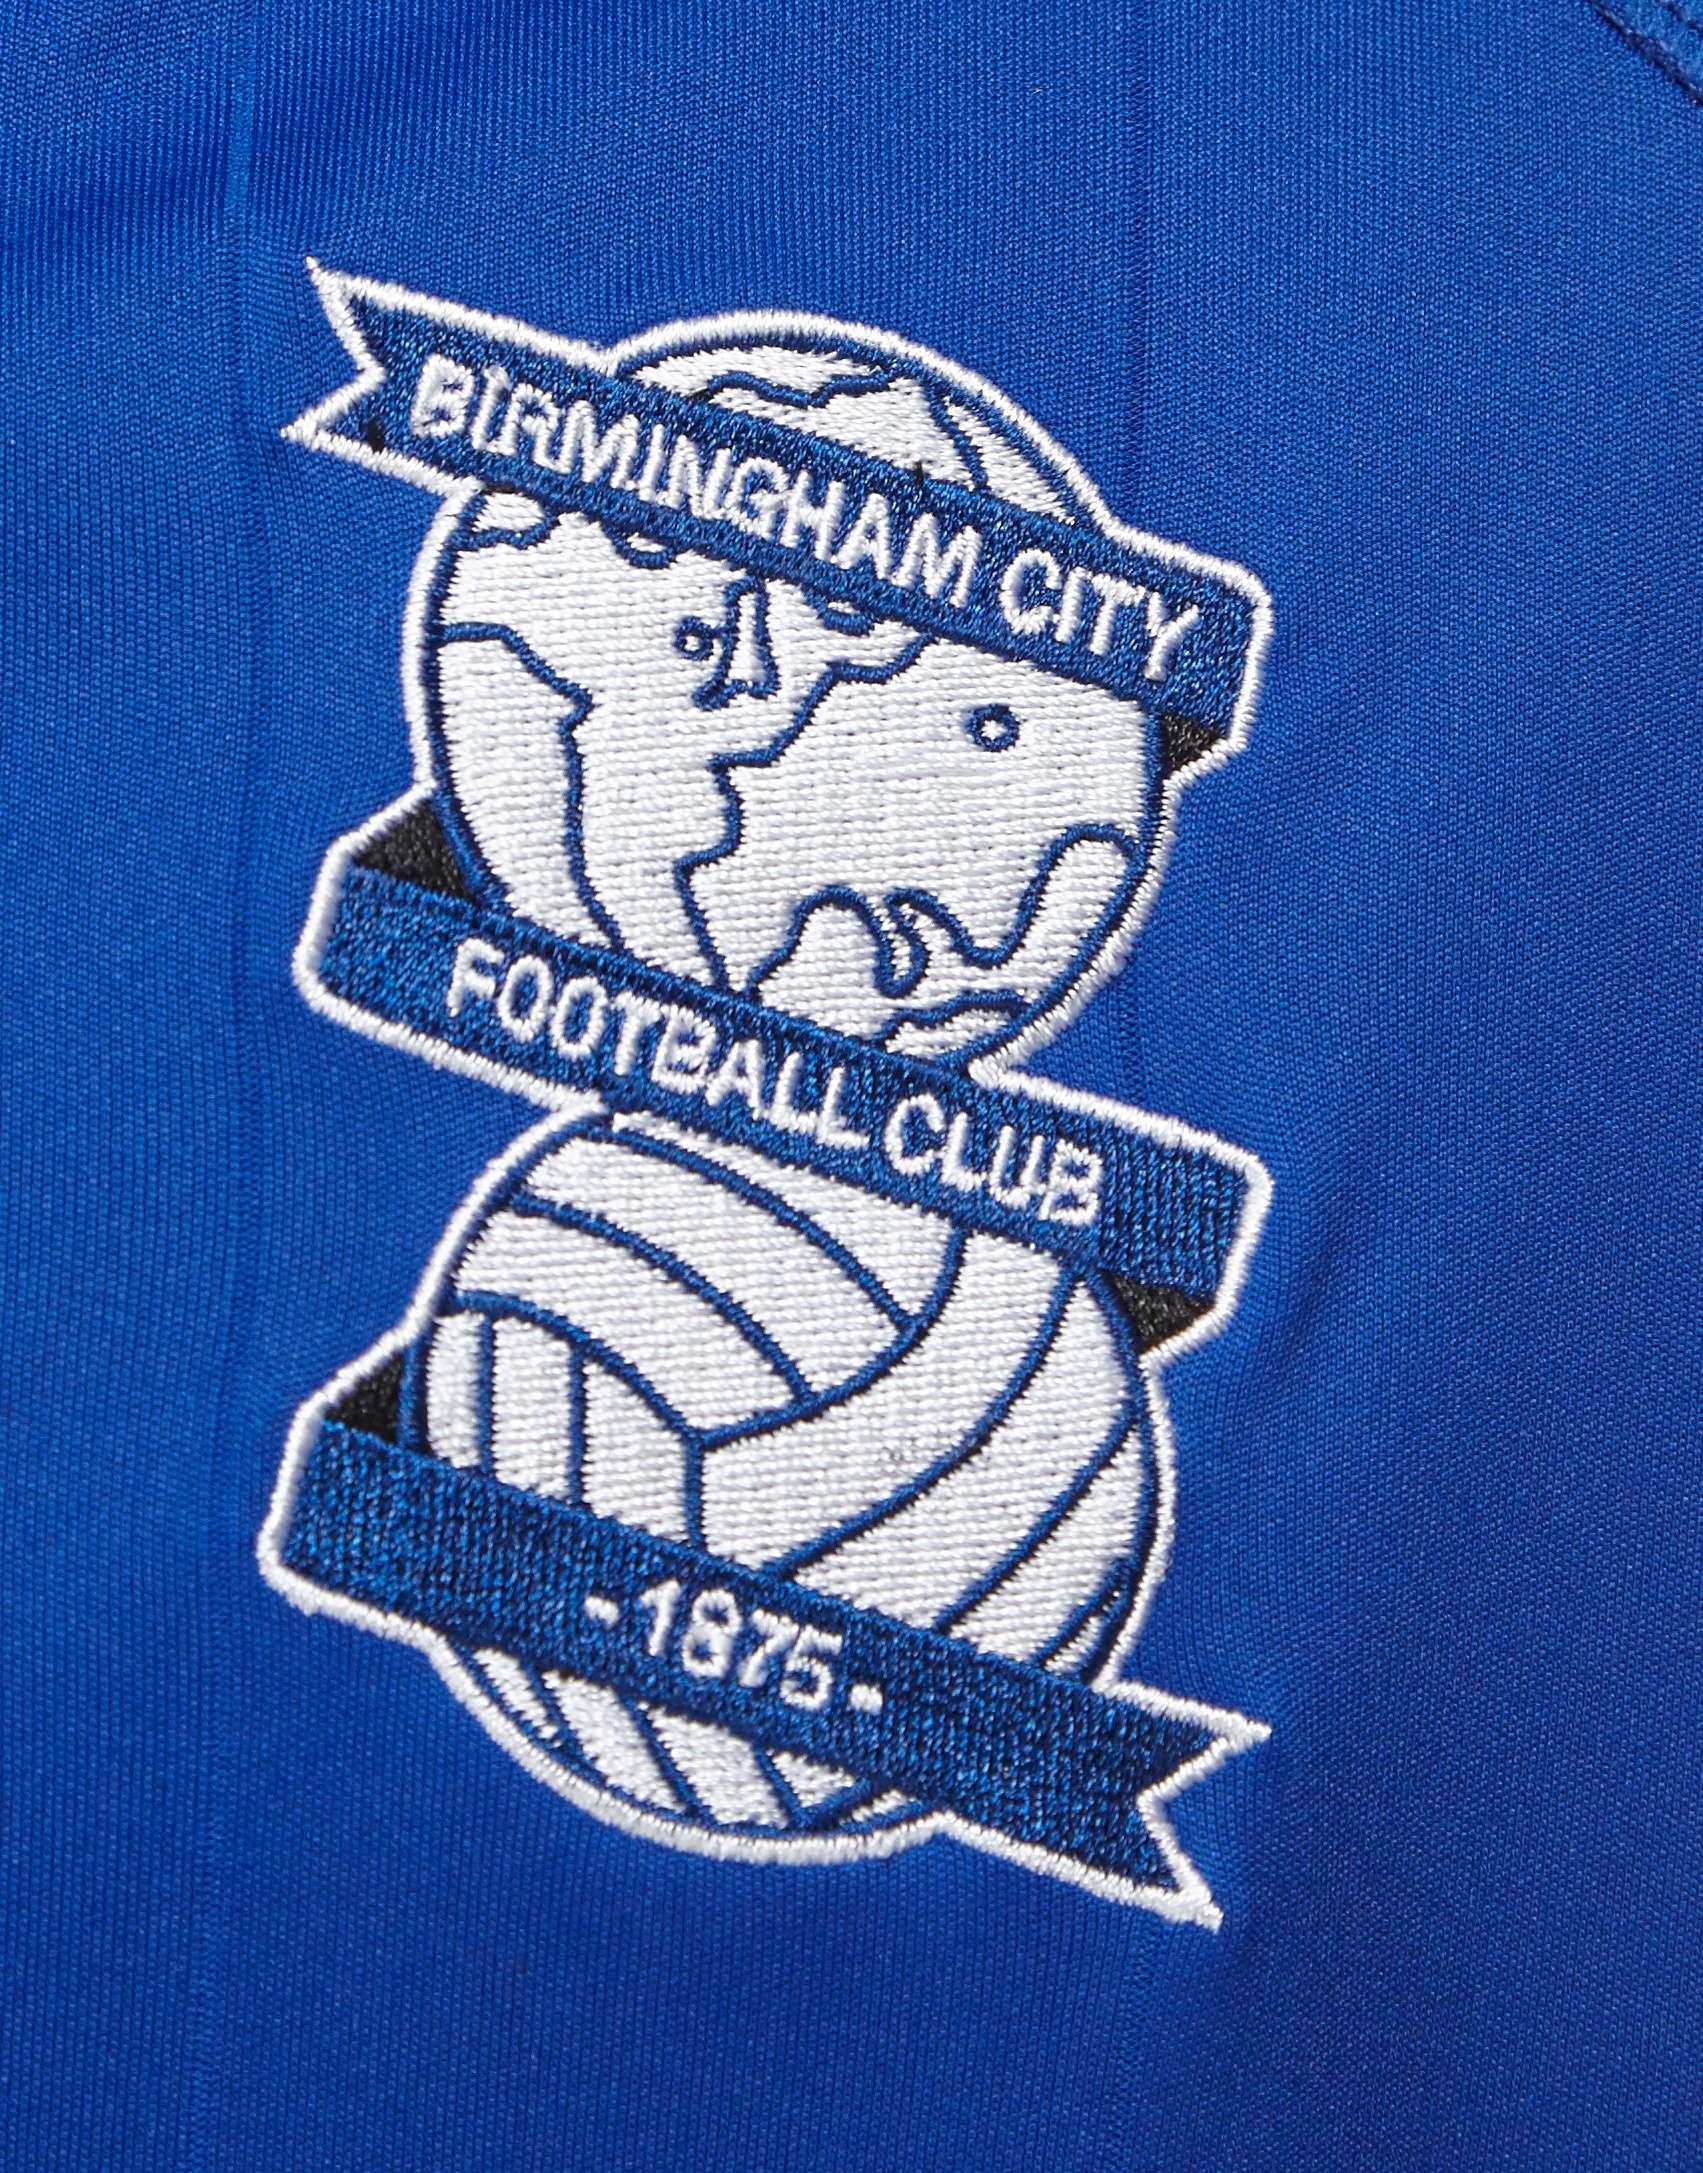 Carbrini Birmingham City FC 2014 Junior Home Shirt